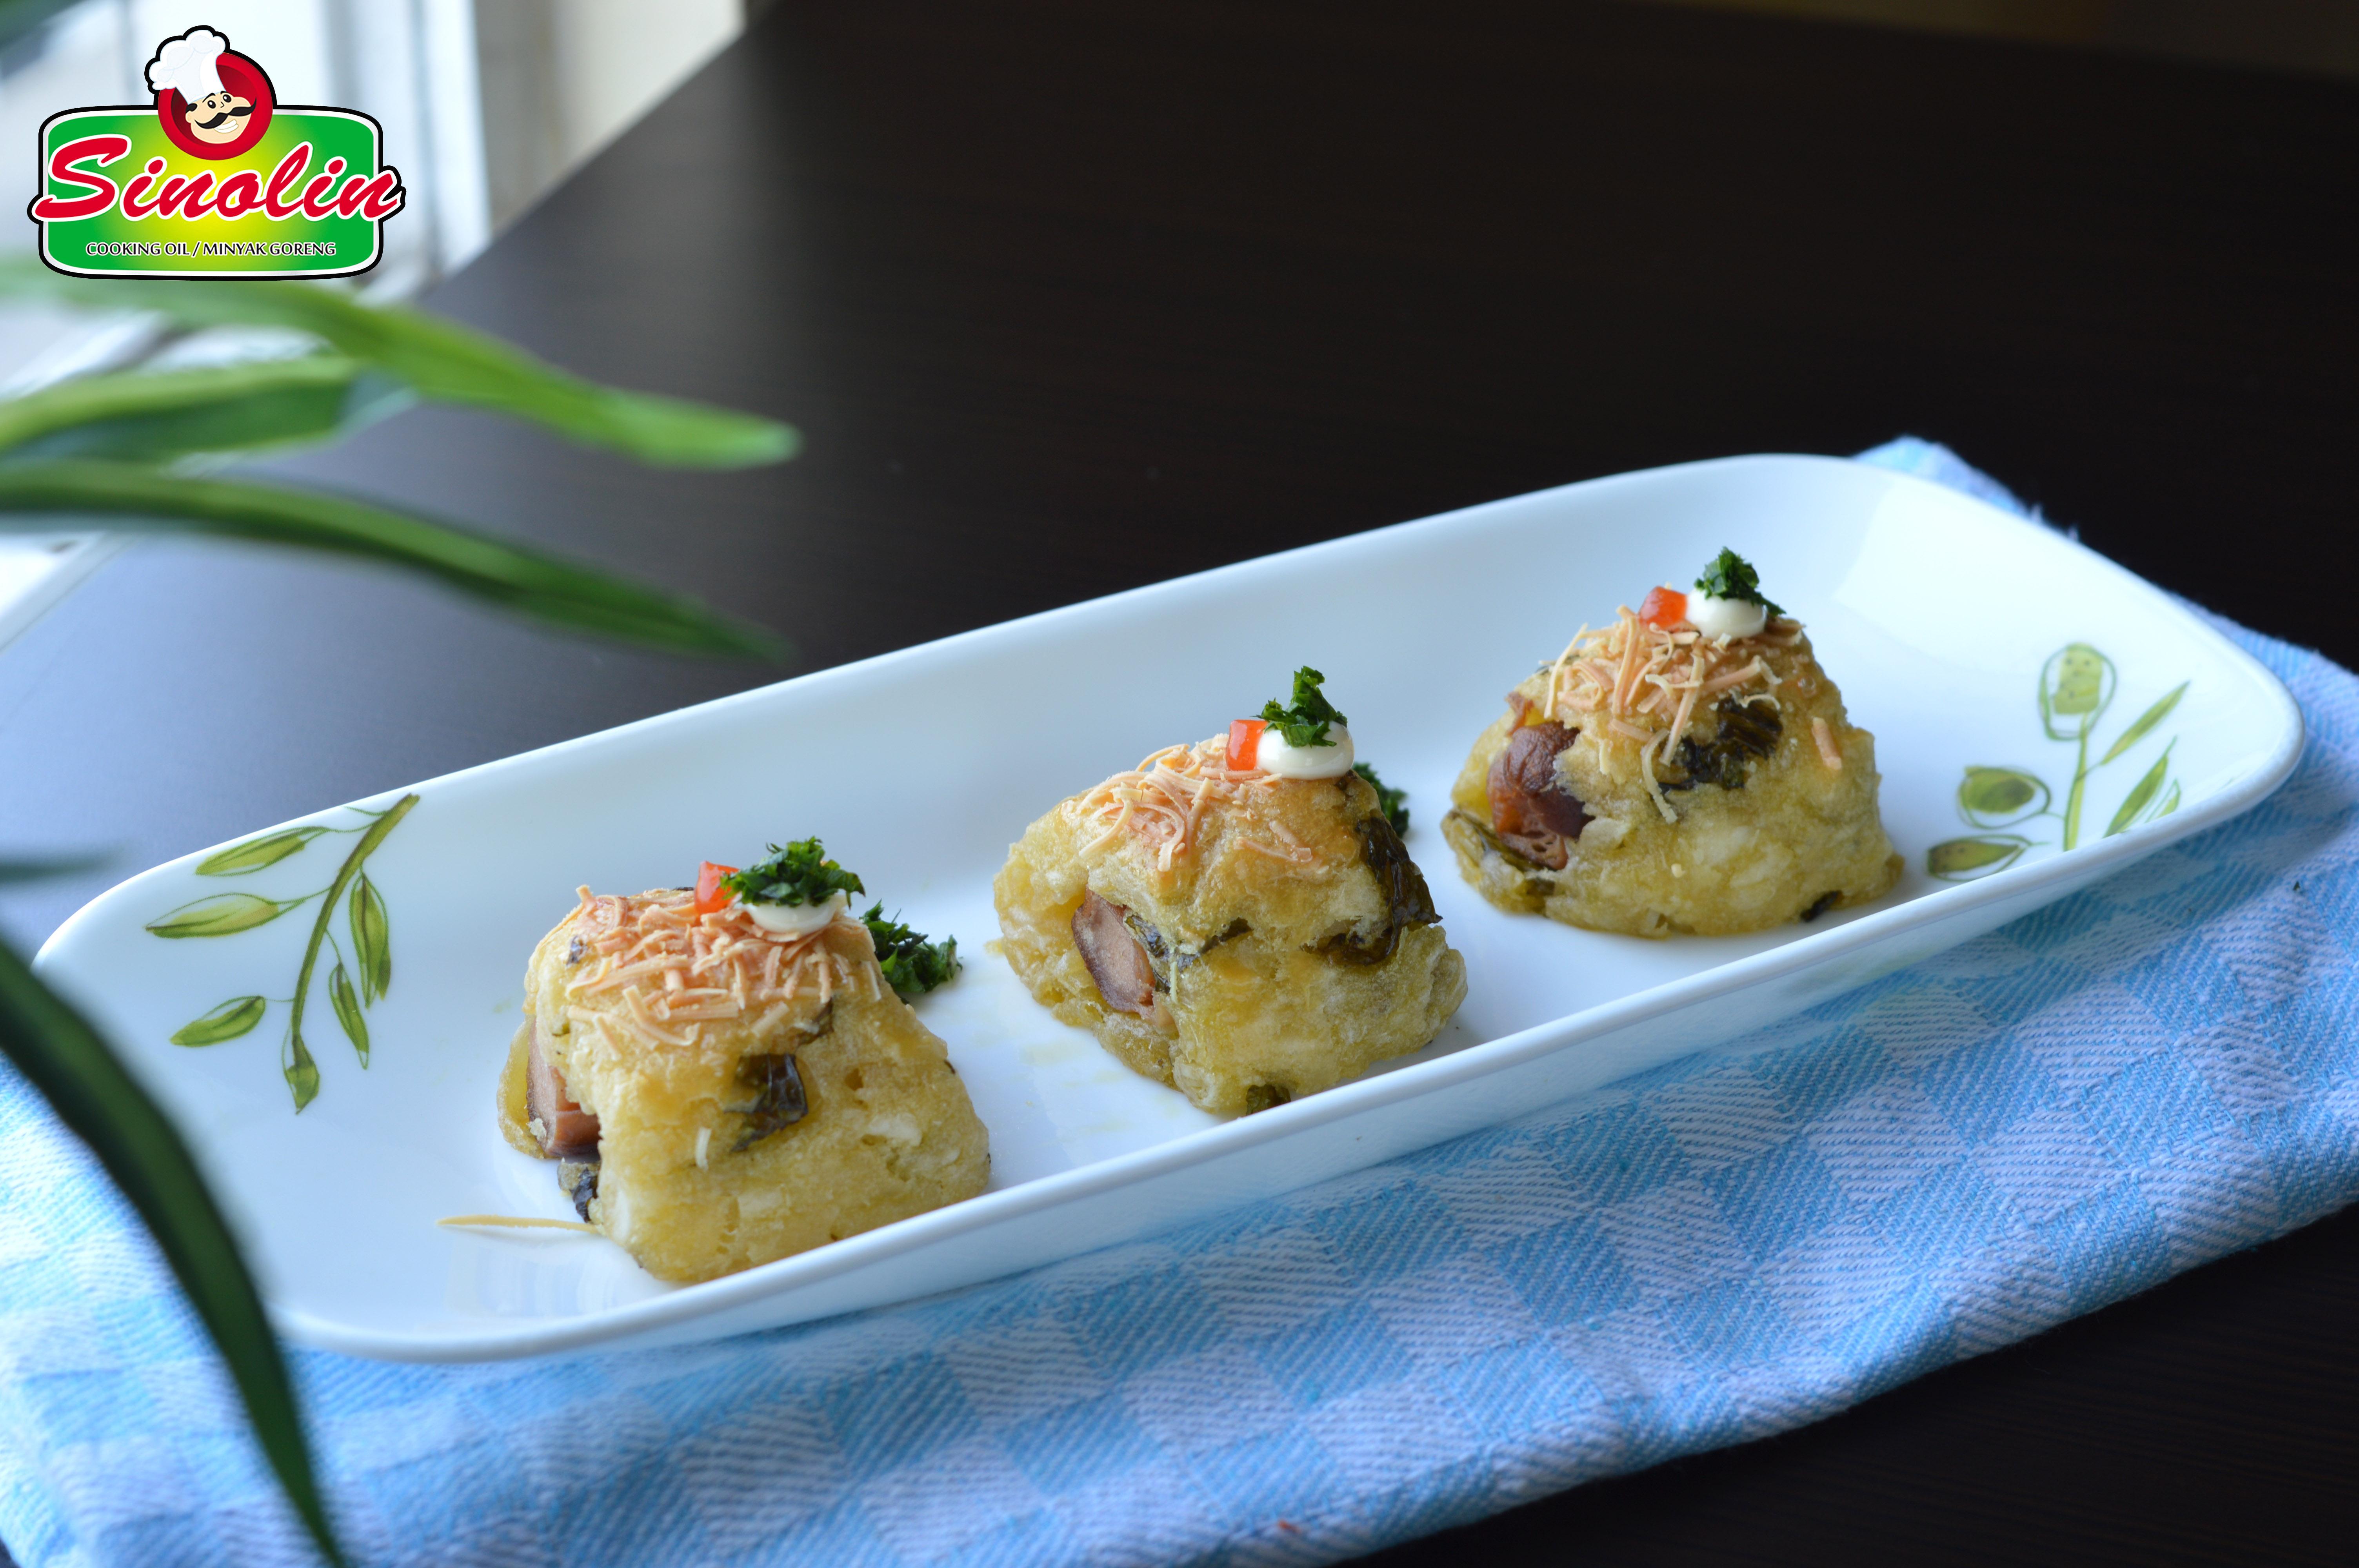 Cassava Roll Sausage Cheese By Dapur Sinolin